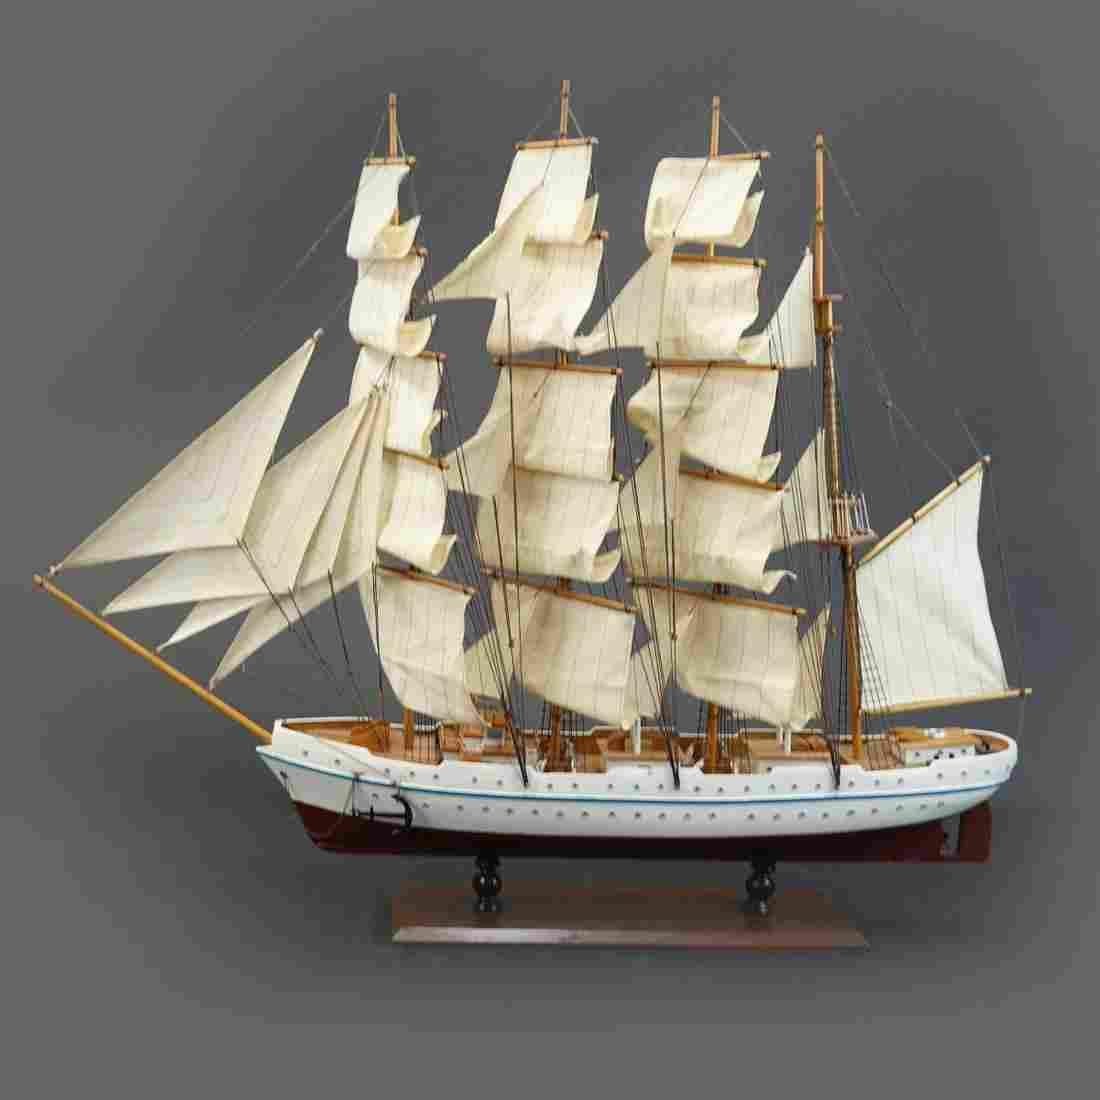 Vintage Barquentine Sailboat Model